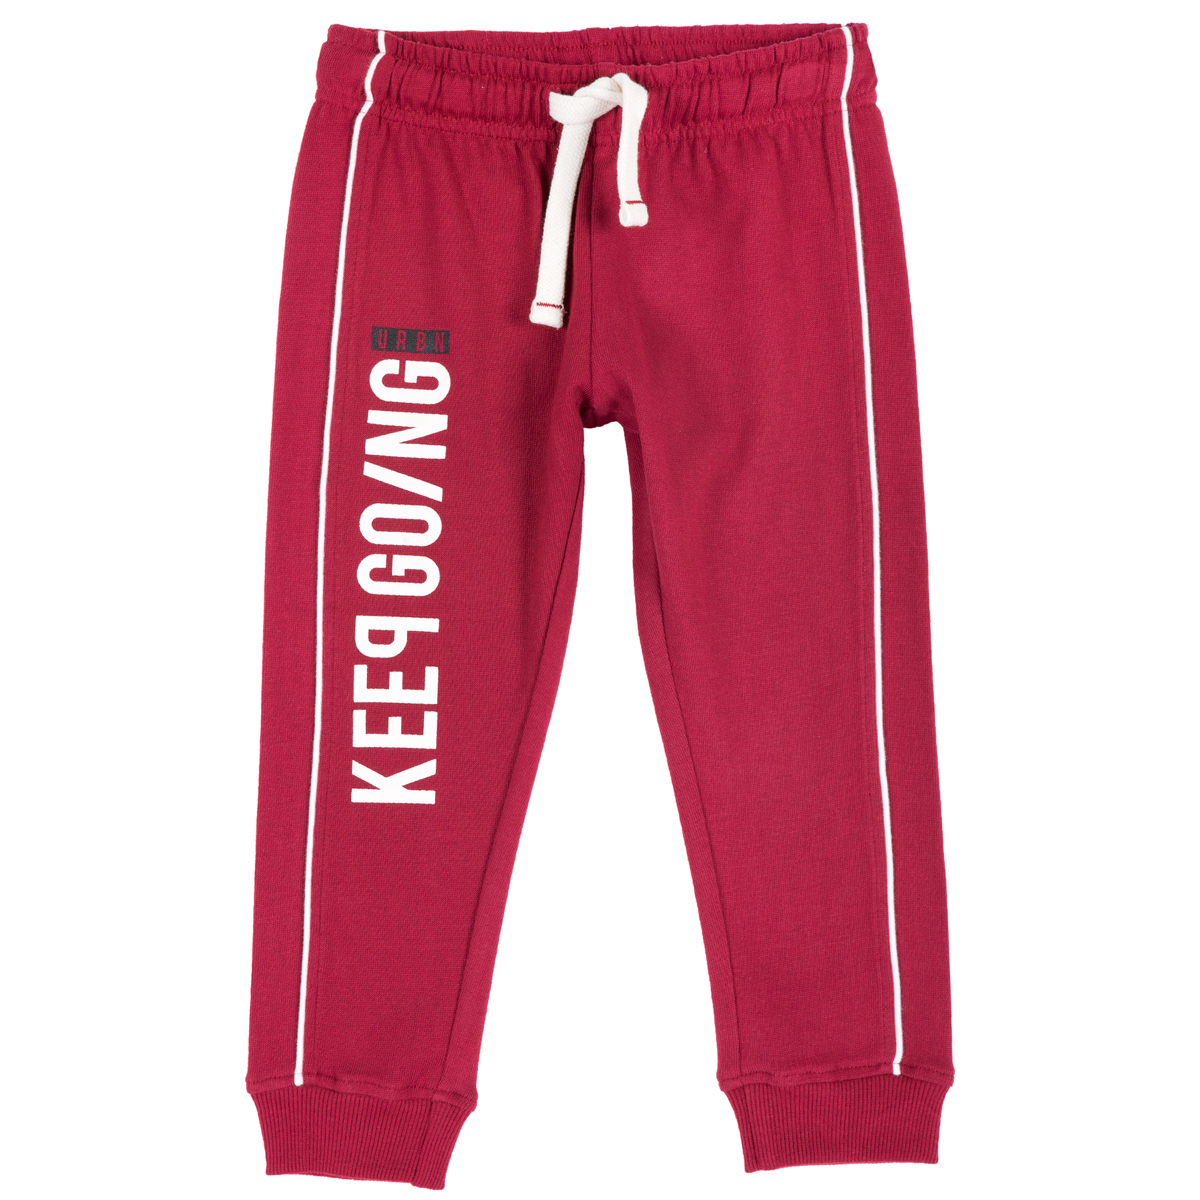 Pantalon trening copii Chicco, visiniu, 94342 din categoria Pantaloni copii